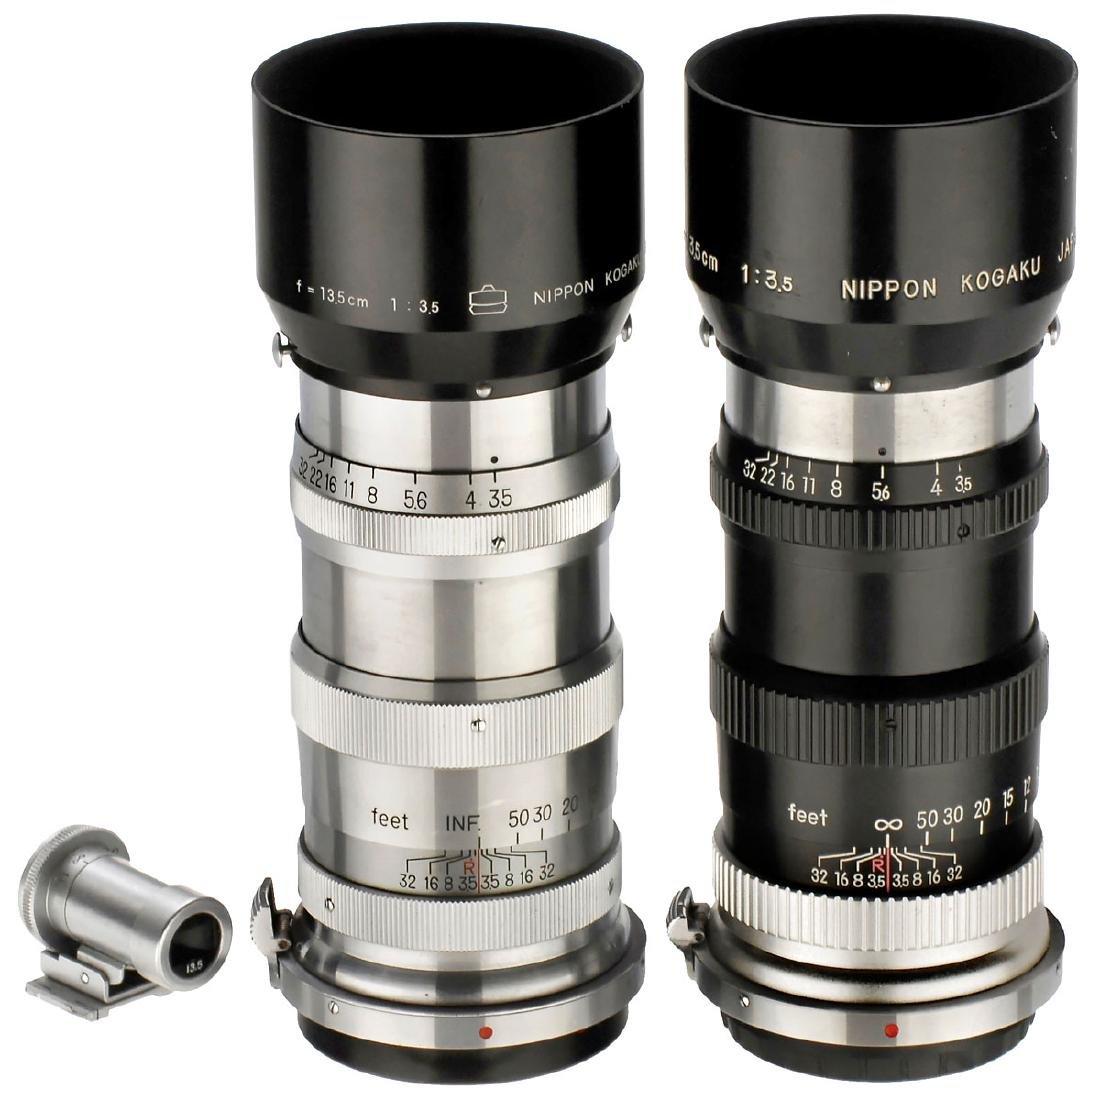 3 Nikkor Lenses - 3